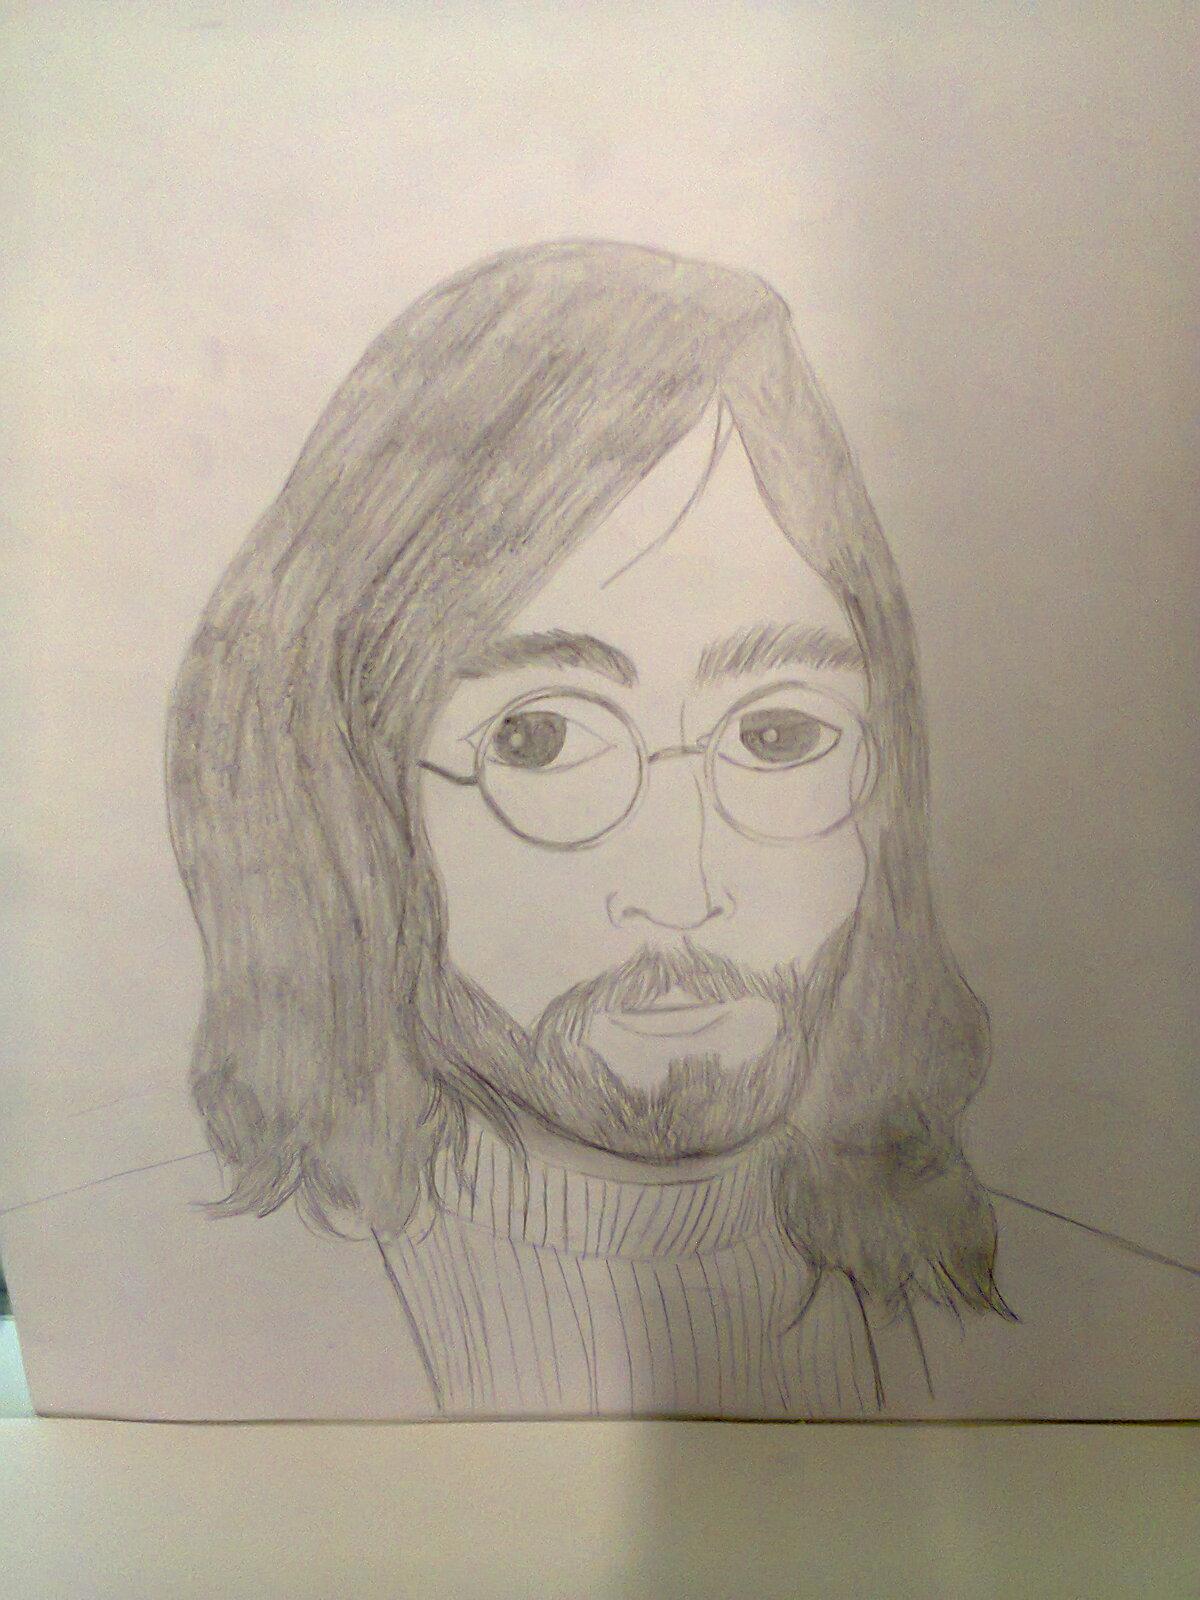 John Lennon drawing